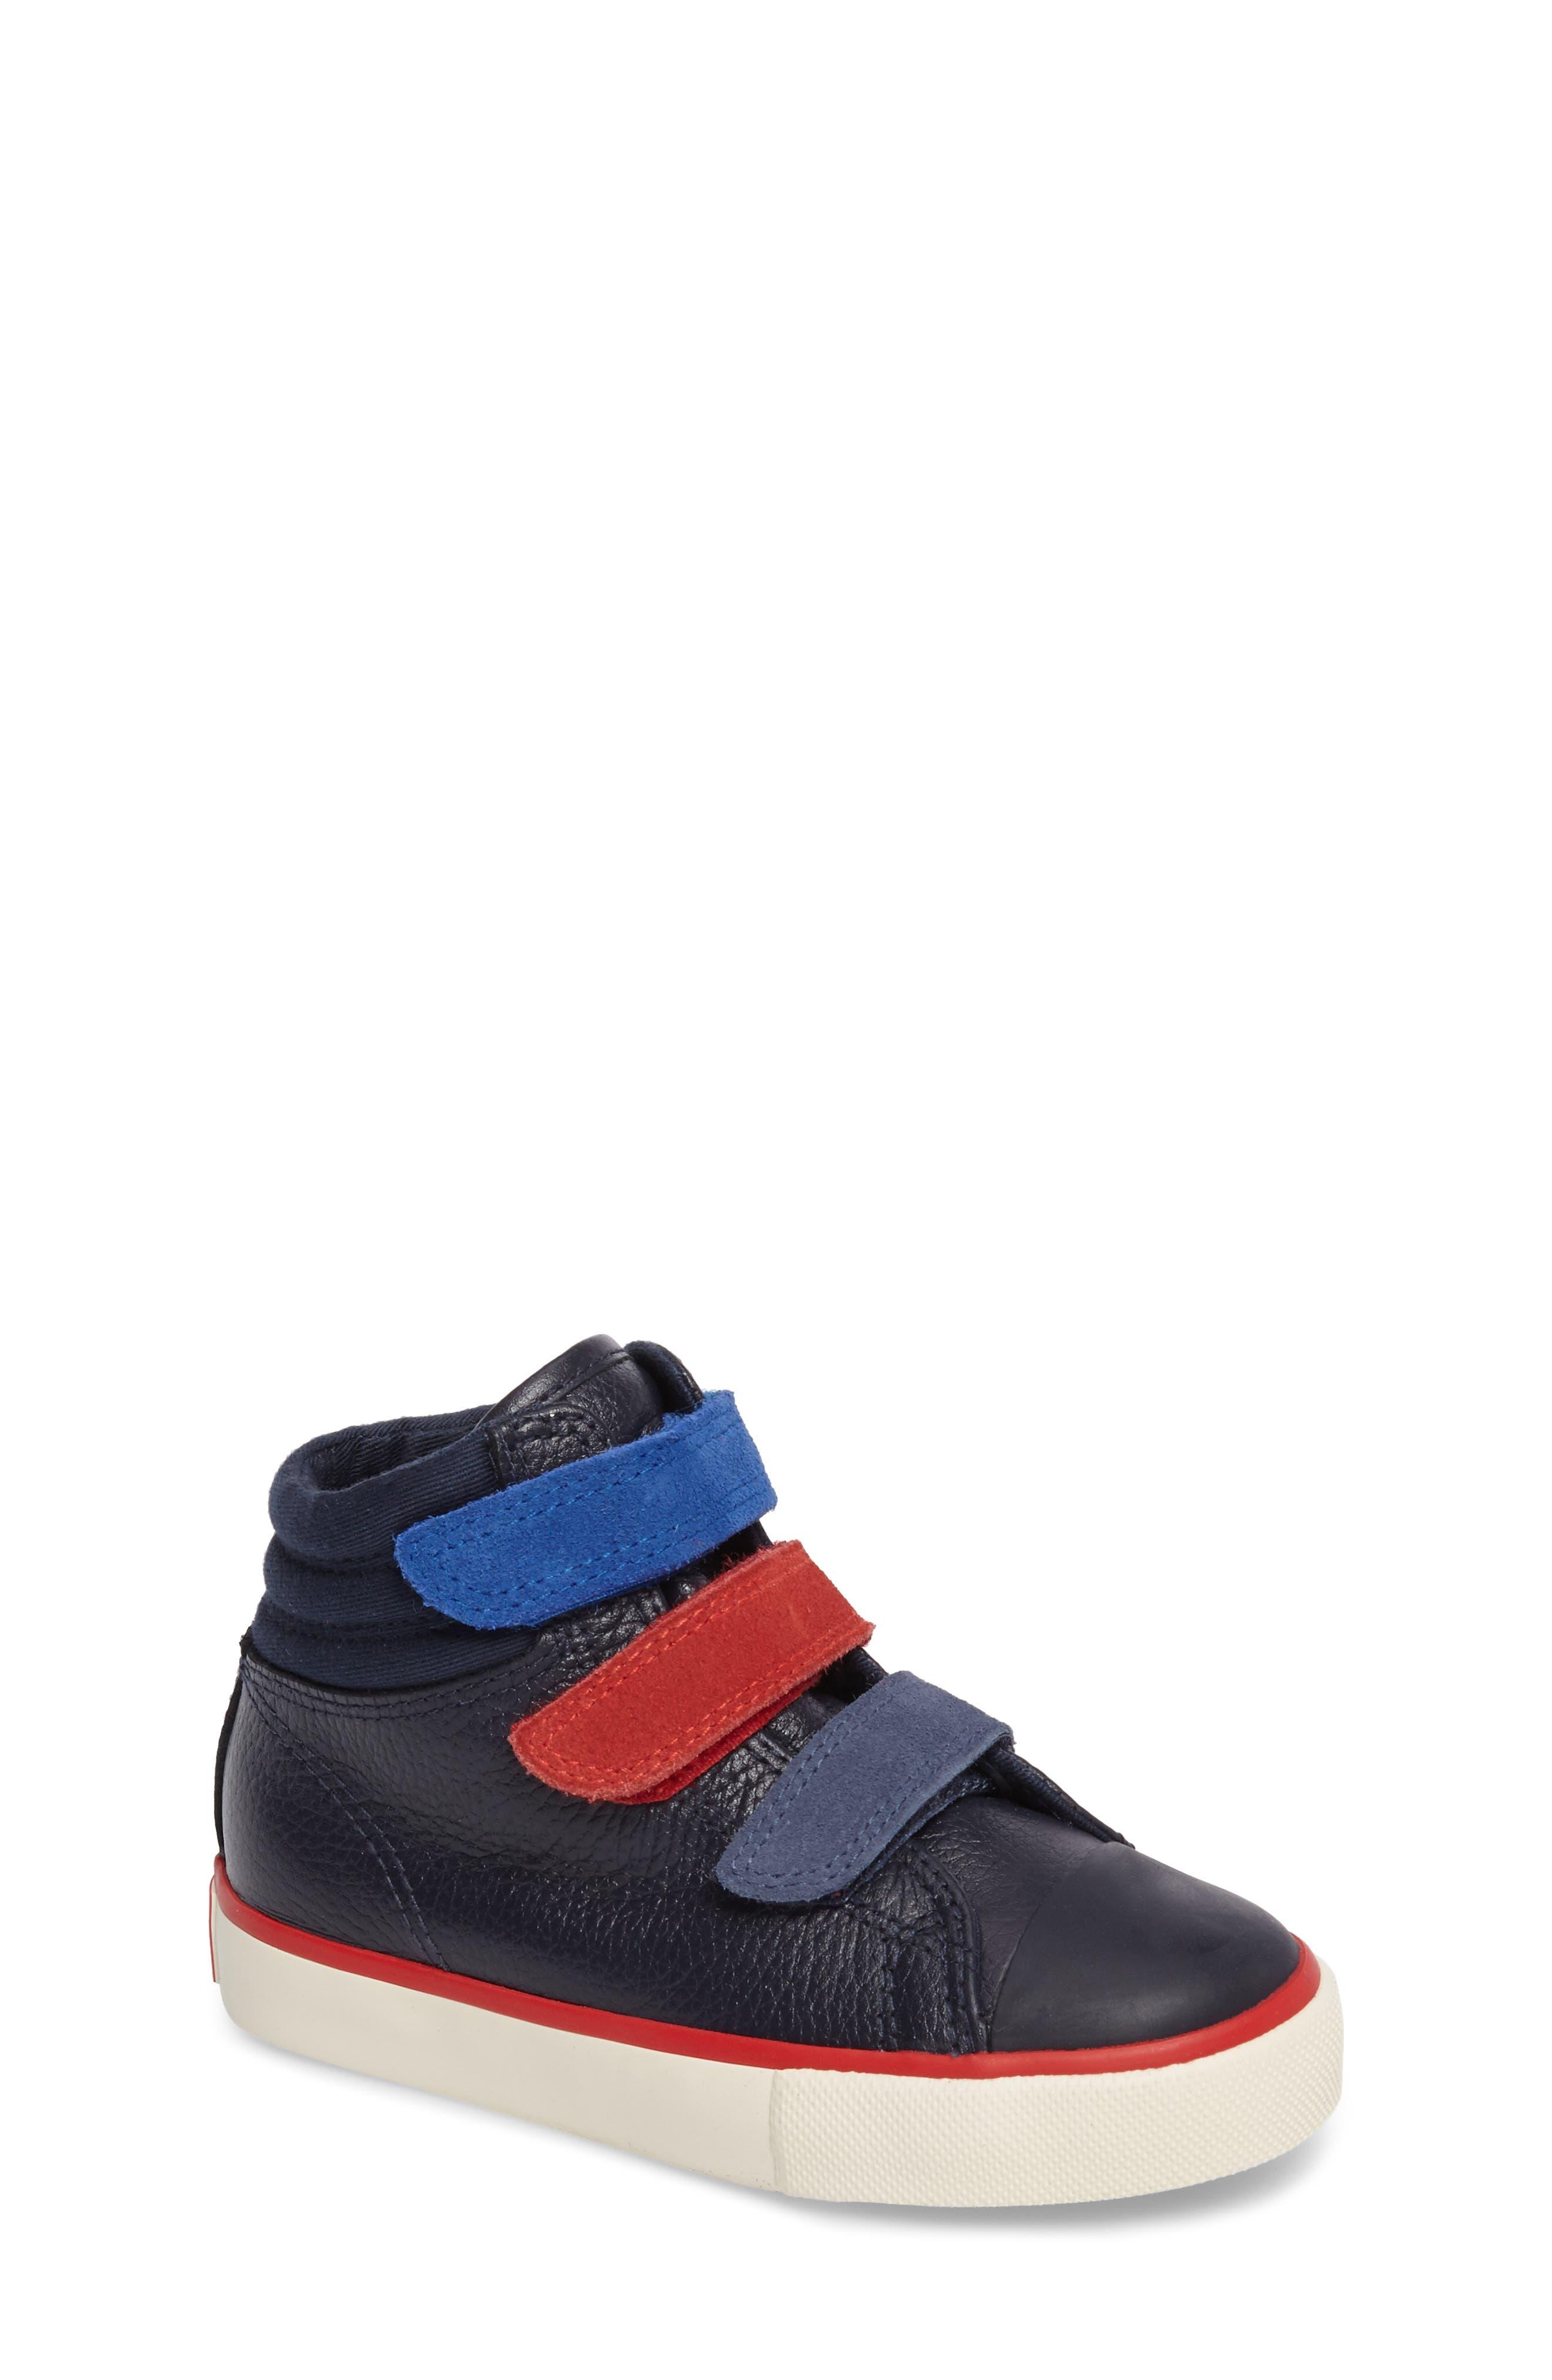 High Top Sneaker,                             Main thumbnail 1, color,                             Navy